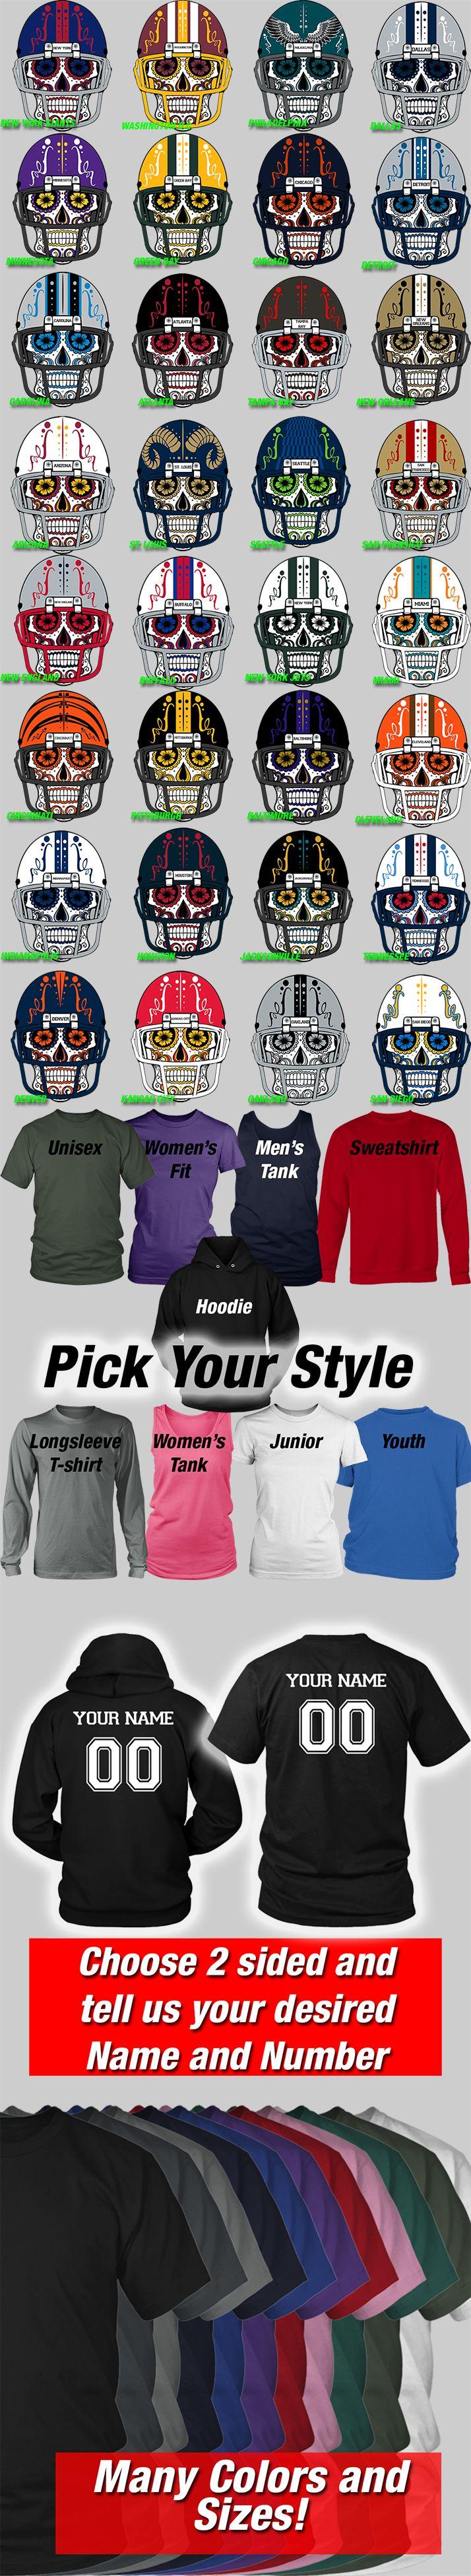 Design your own football jersey t-shirt - Custom Nfl Team Shirts And Hoodies Sugar Skull Calavera Nfl Designs On